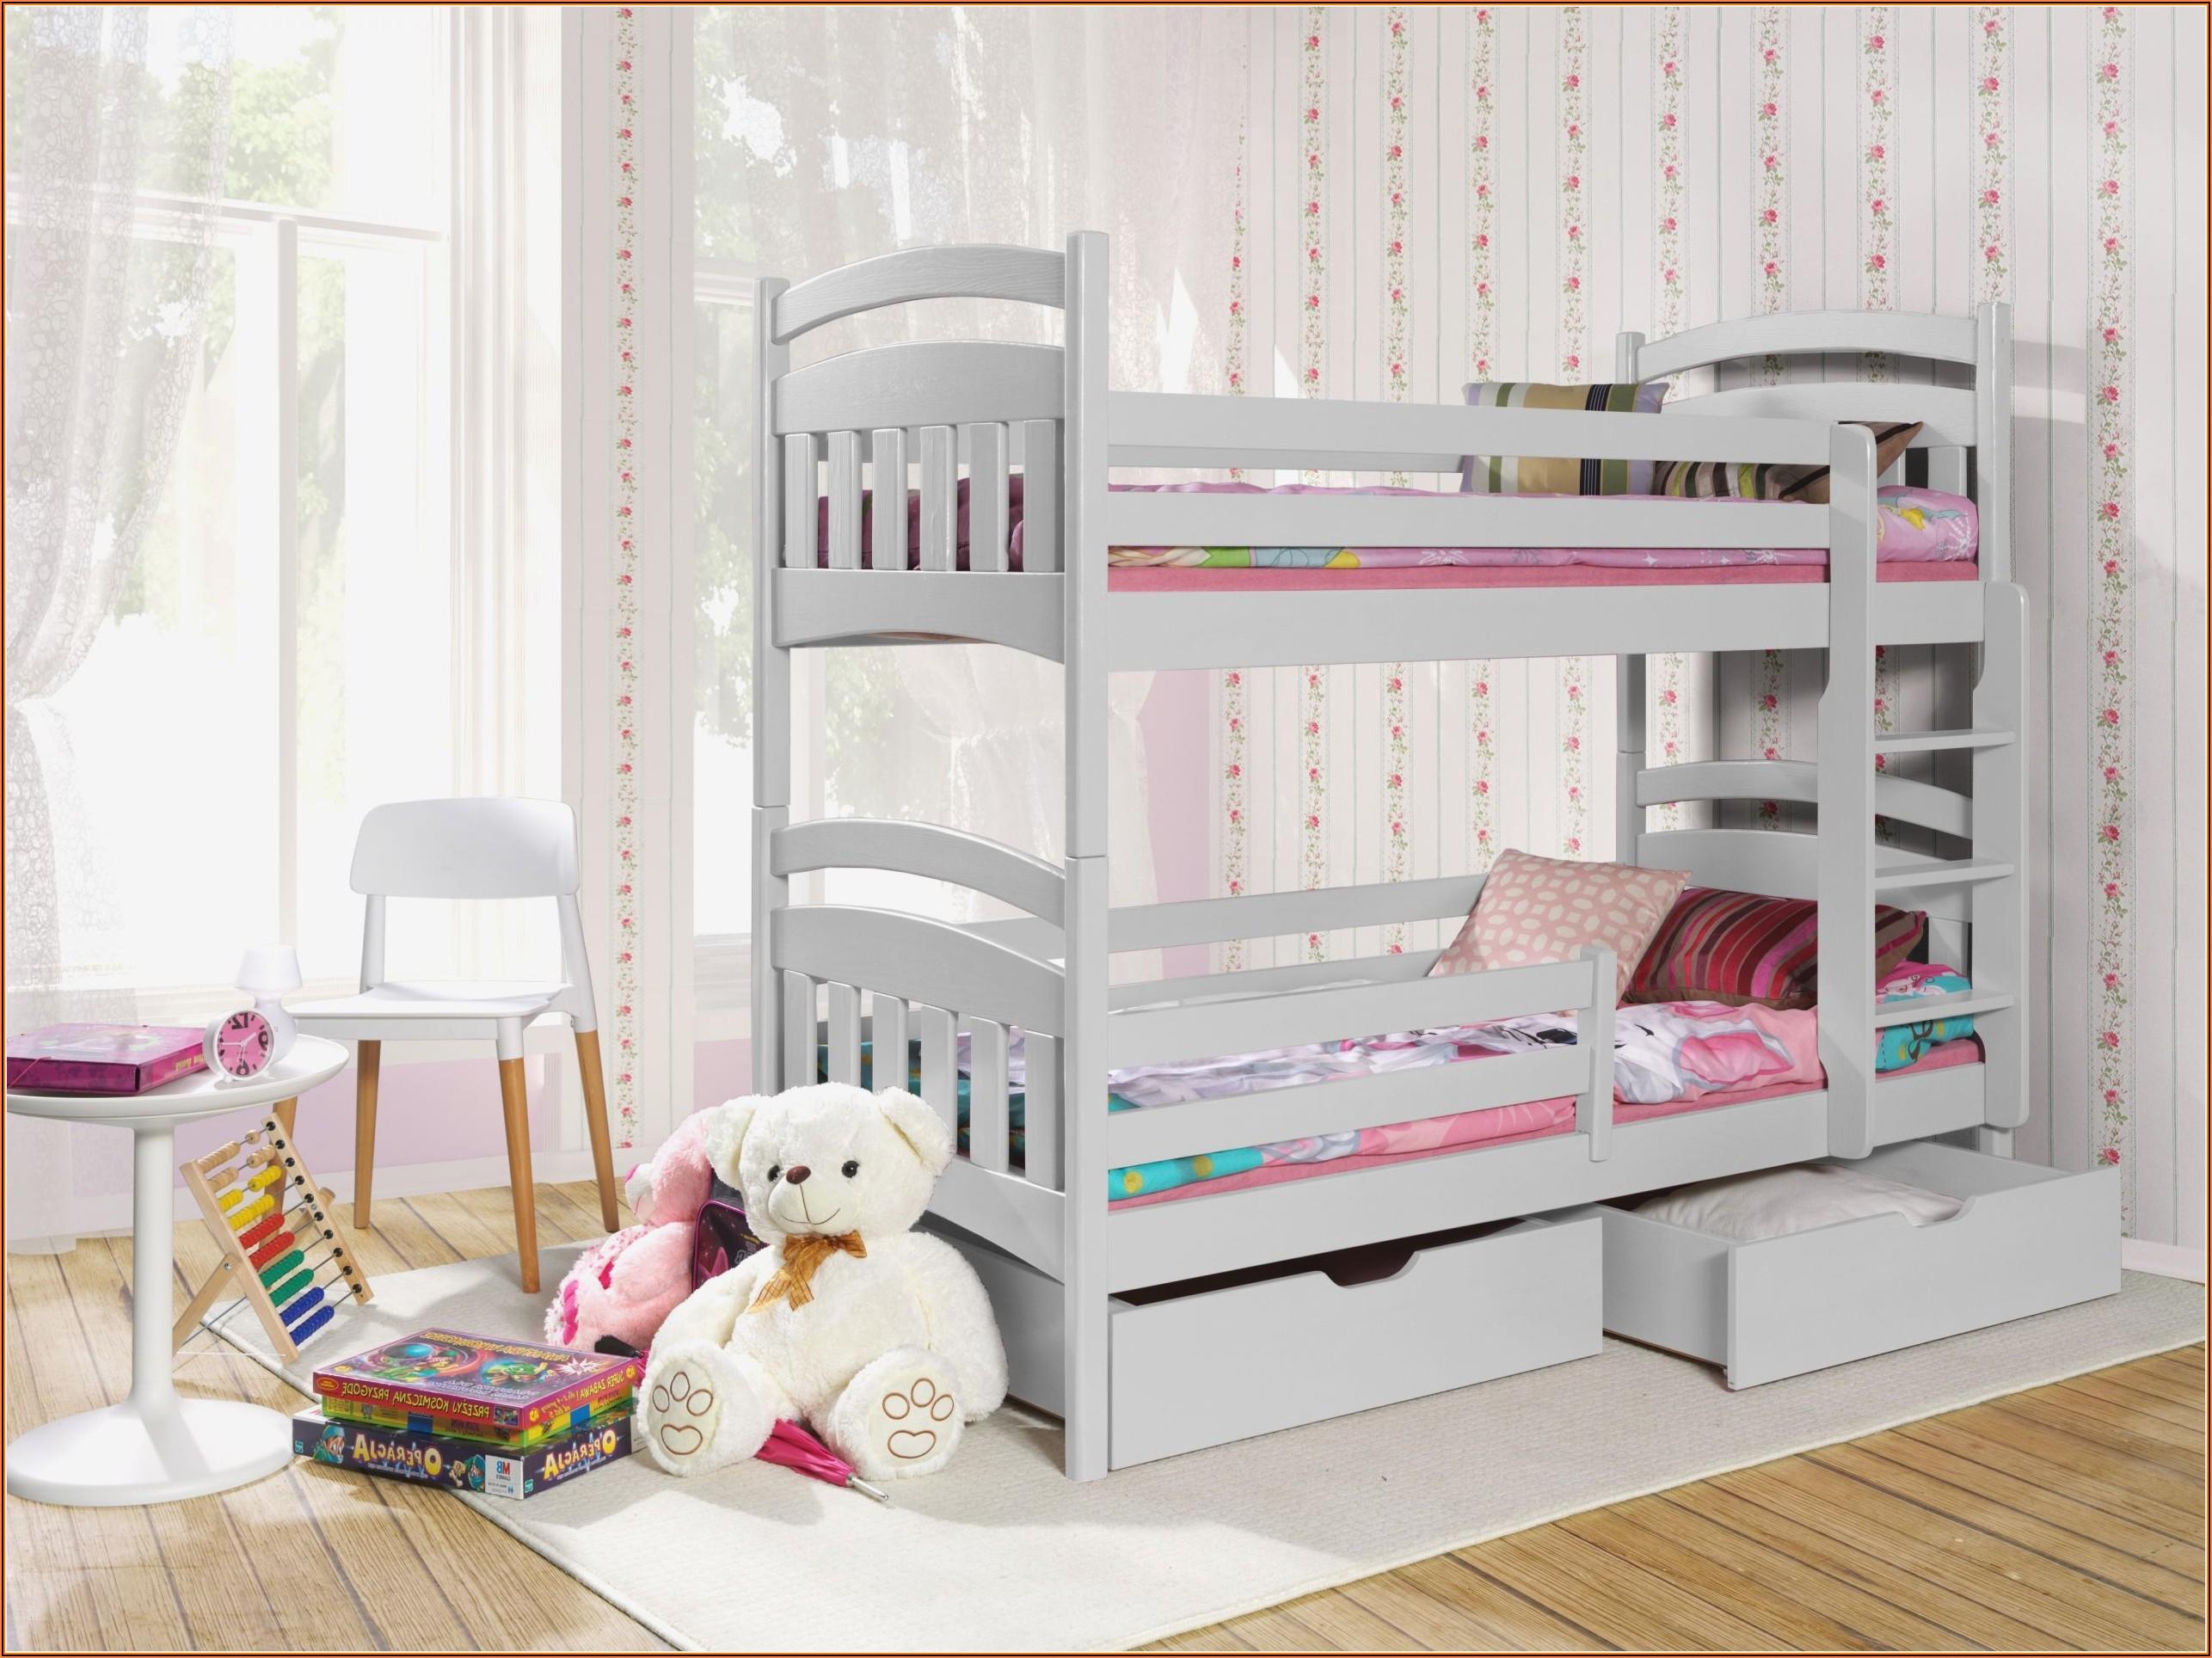 Kinderzimmer Matratze Am Boden